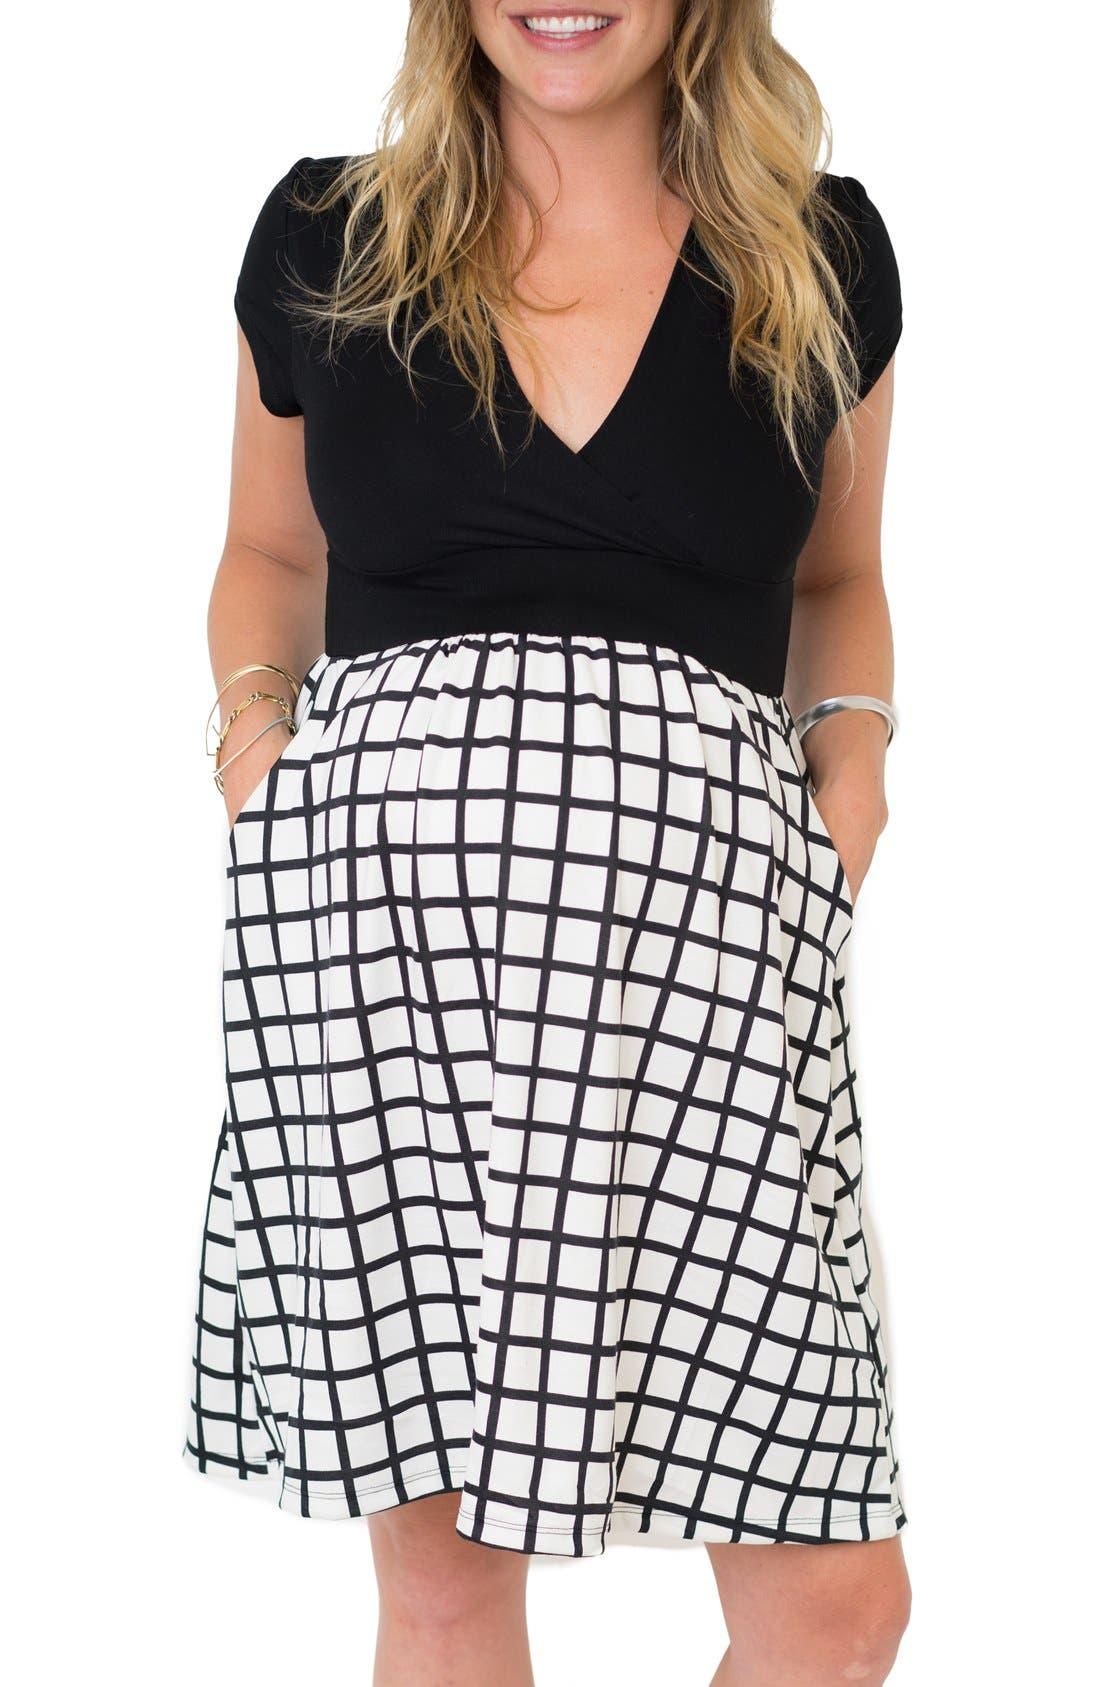 'Samantha' Surplice Maternity/Nursing Dress,                             Main thumbnail 1, color,                             Black Windowpane